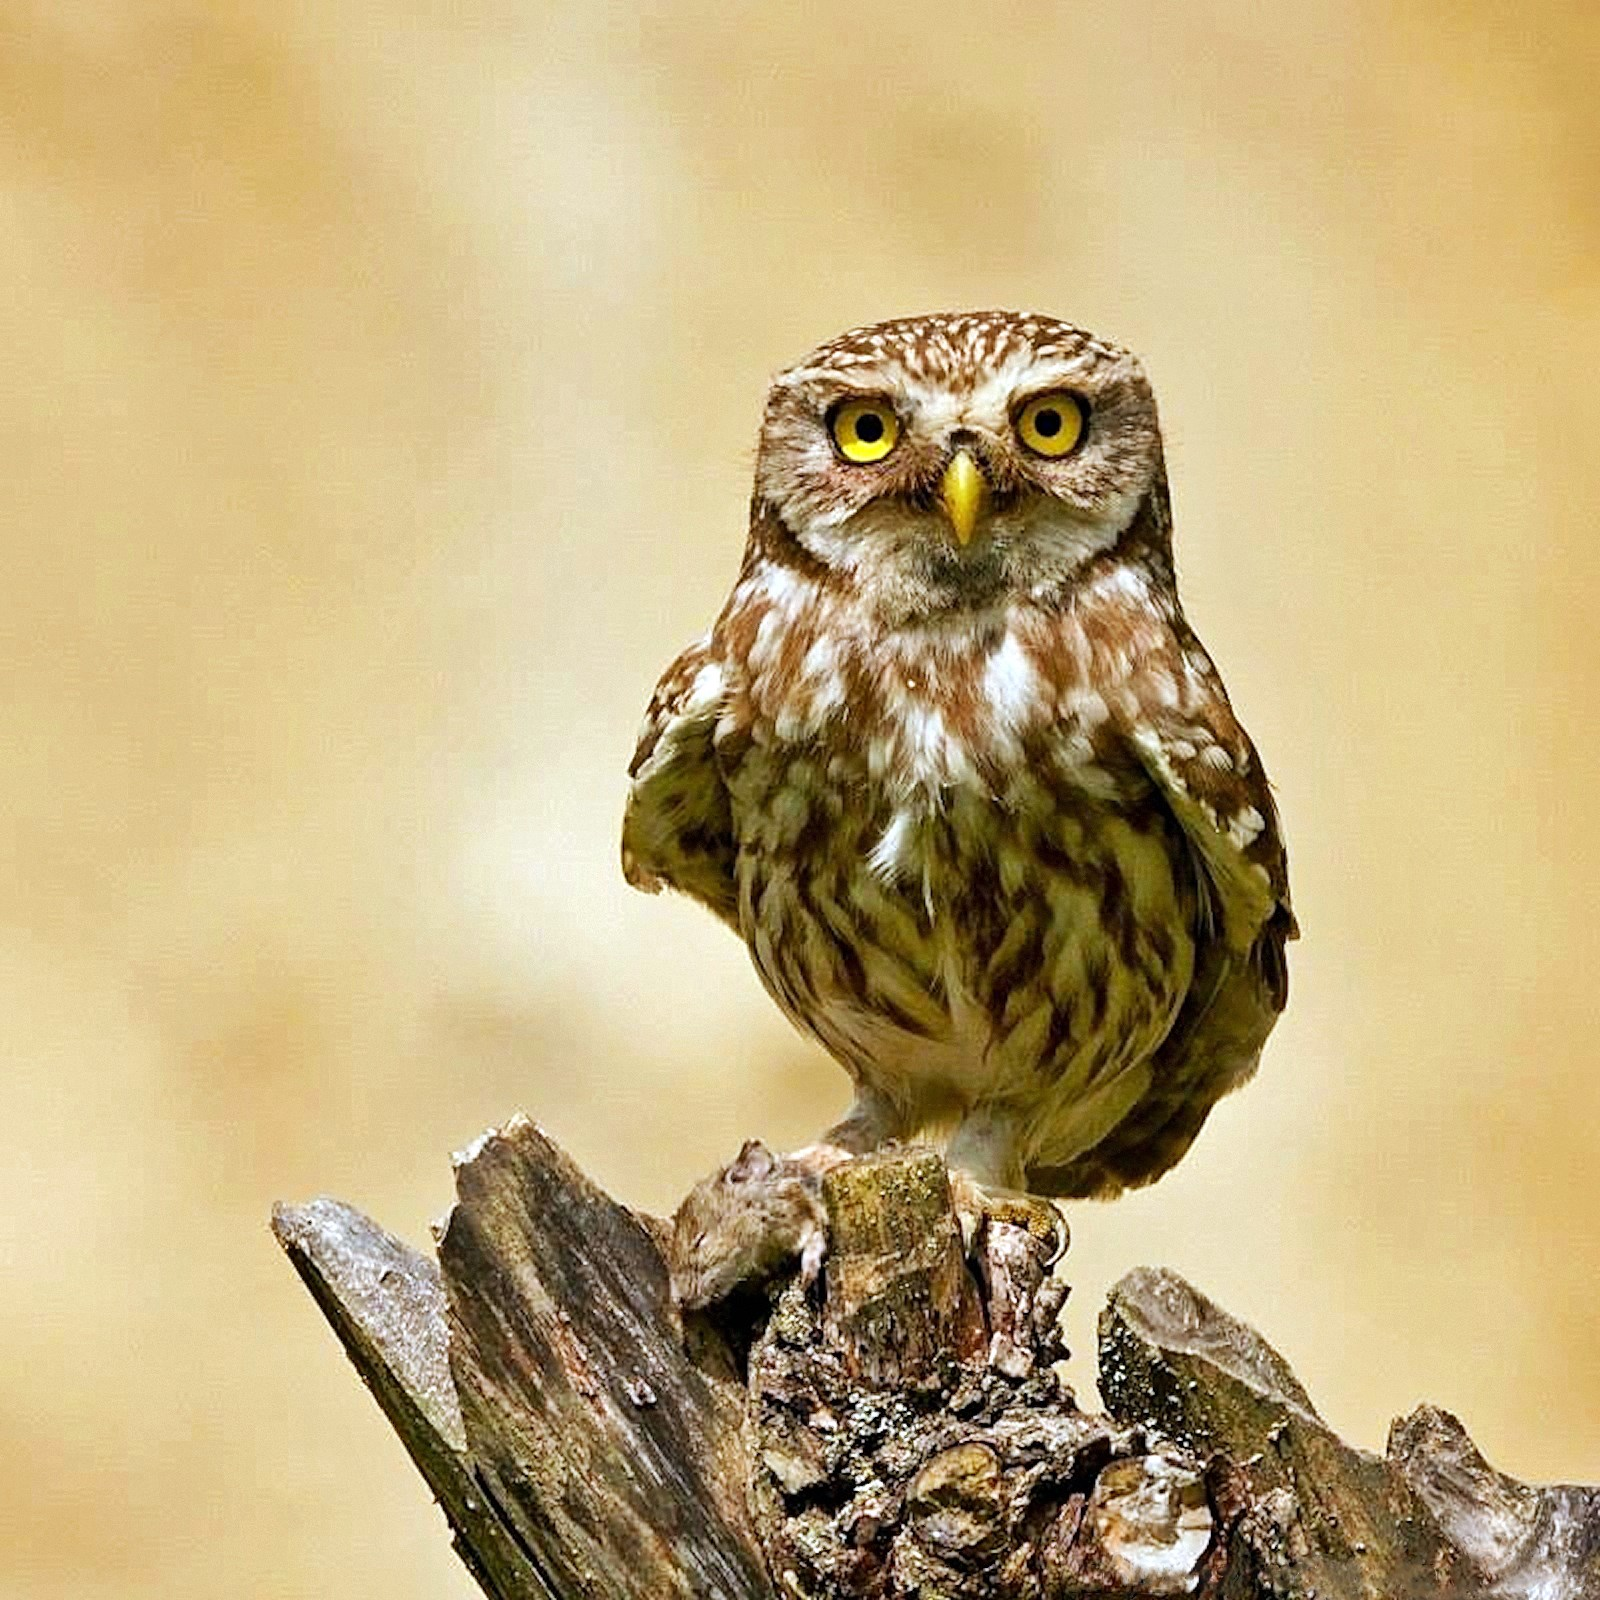 00 Tatyana Zherebtsov. A Llittle Owl (Athene noctua). 2015